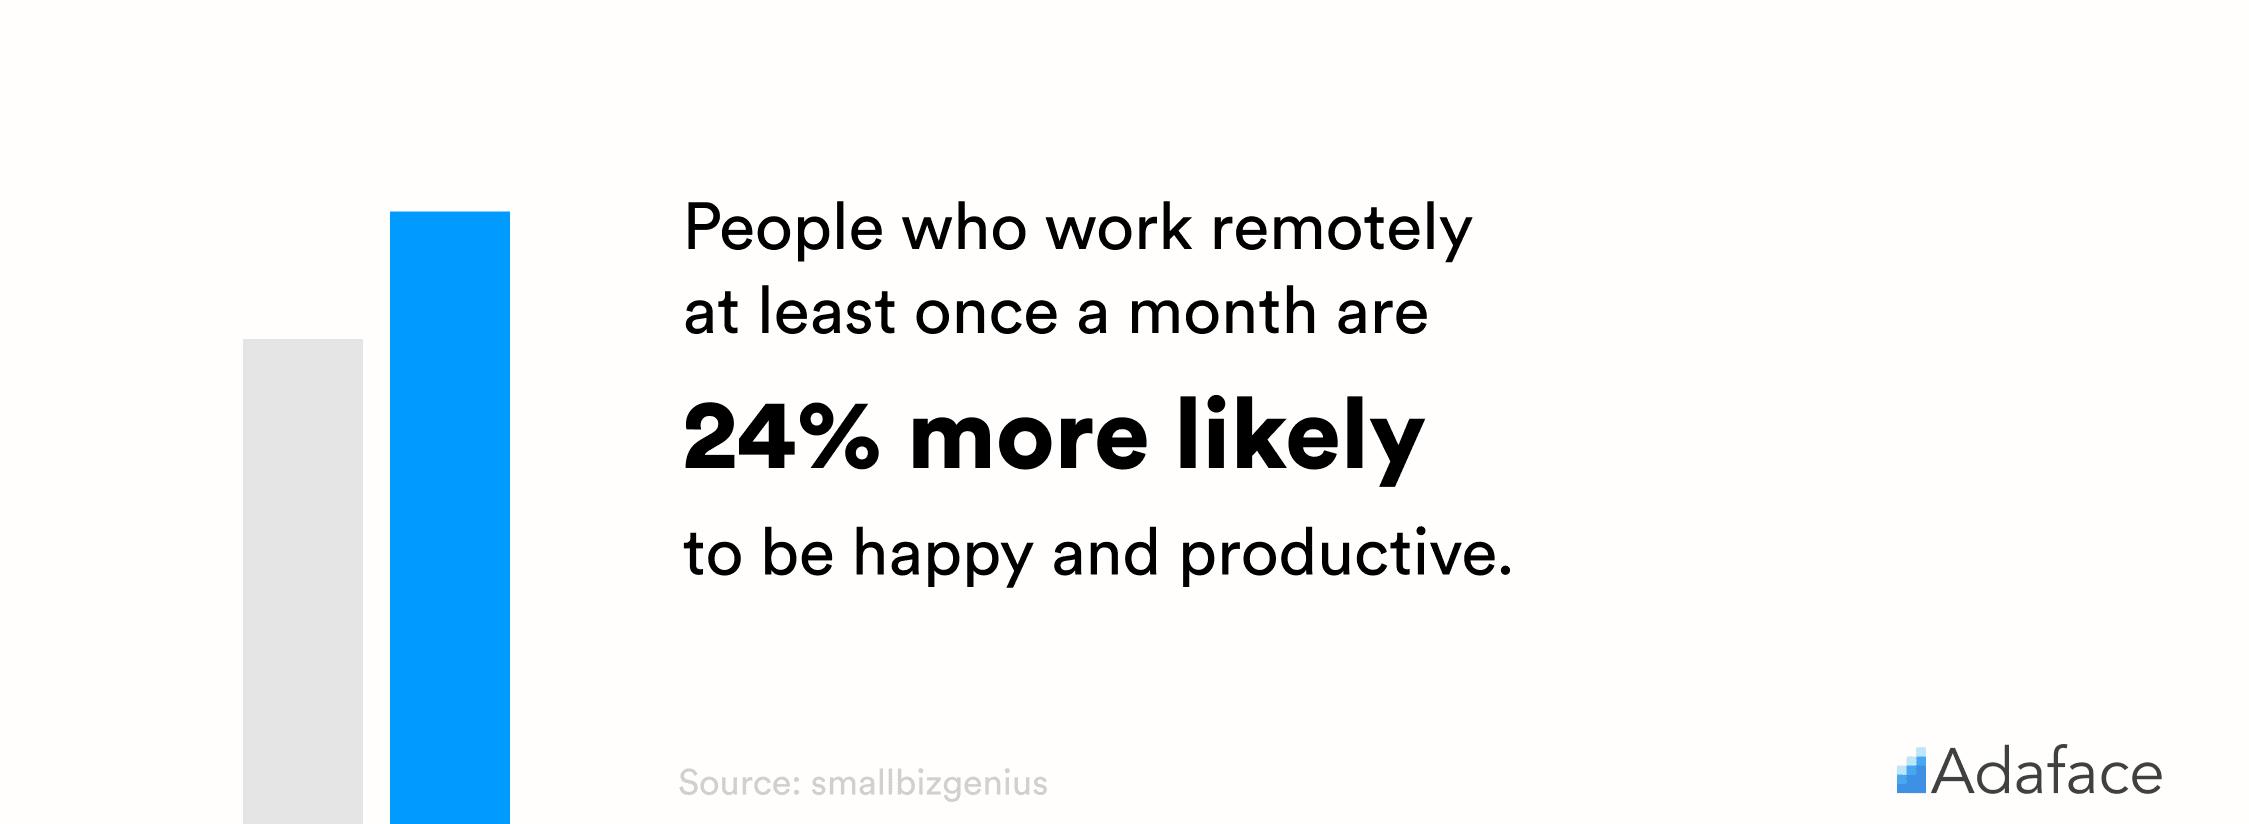 Remote work statistics - Adaface